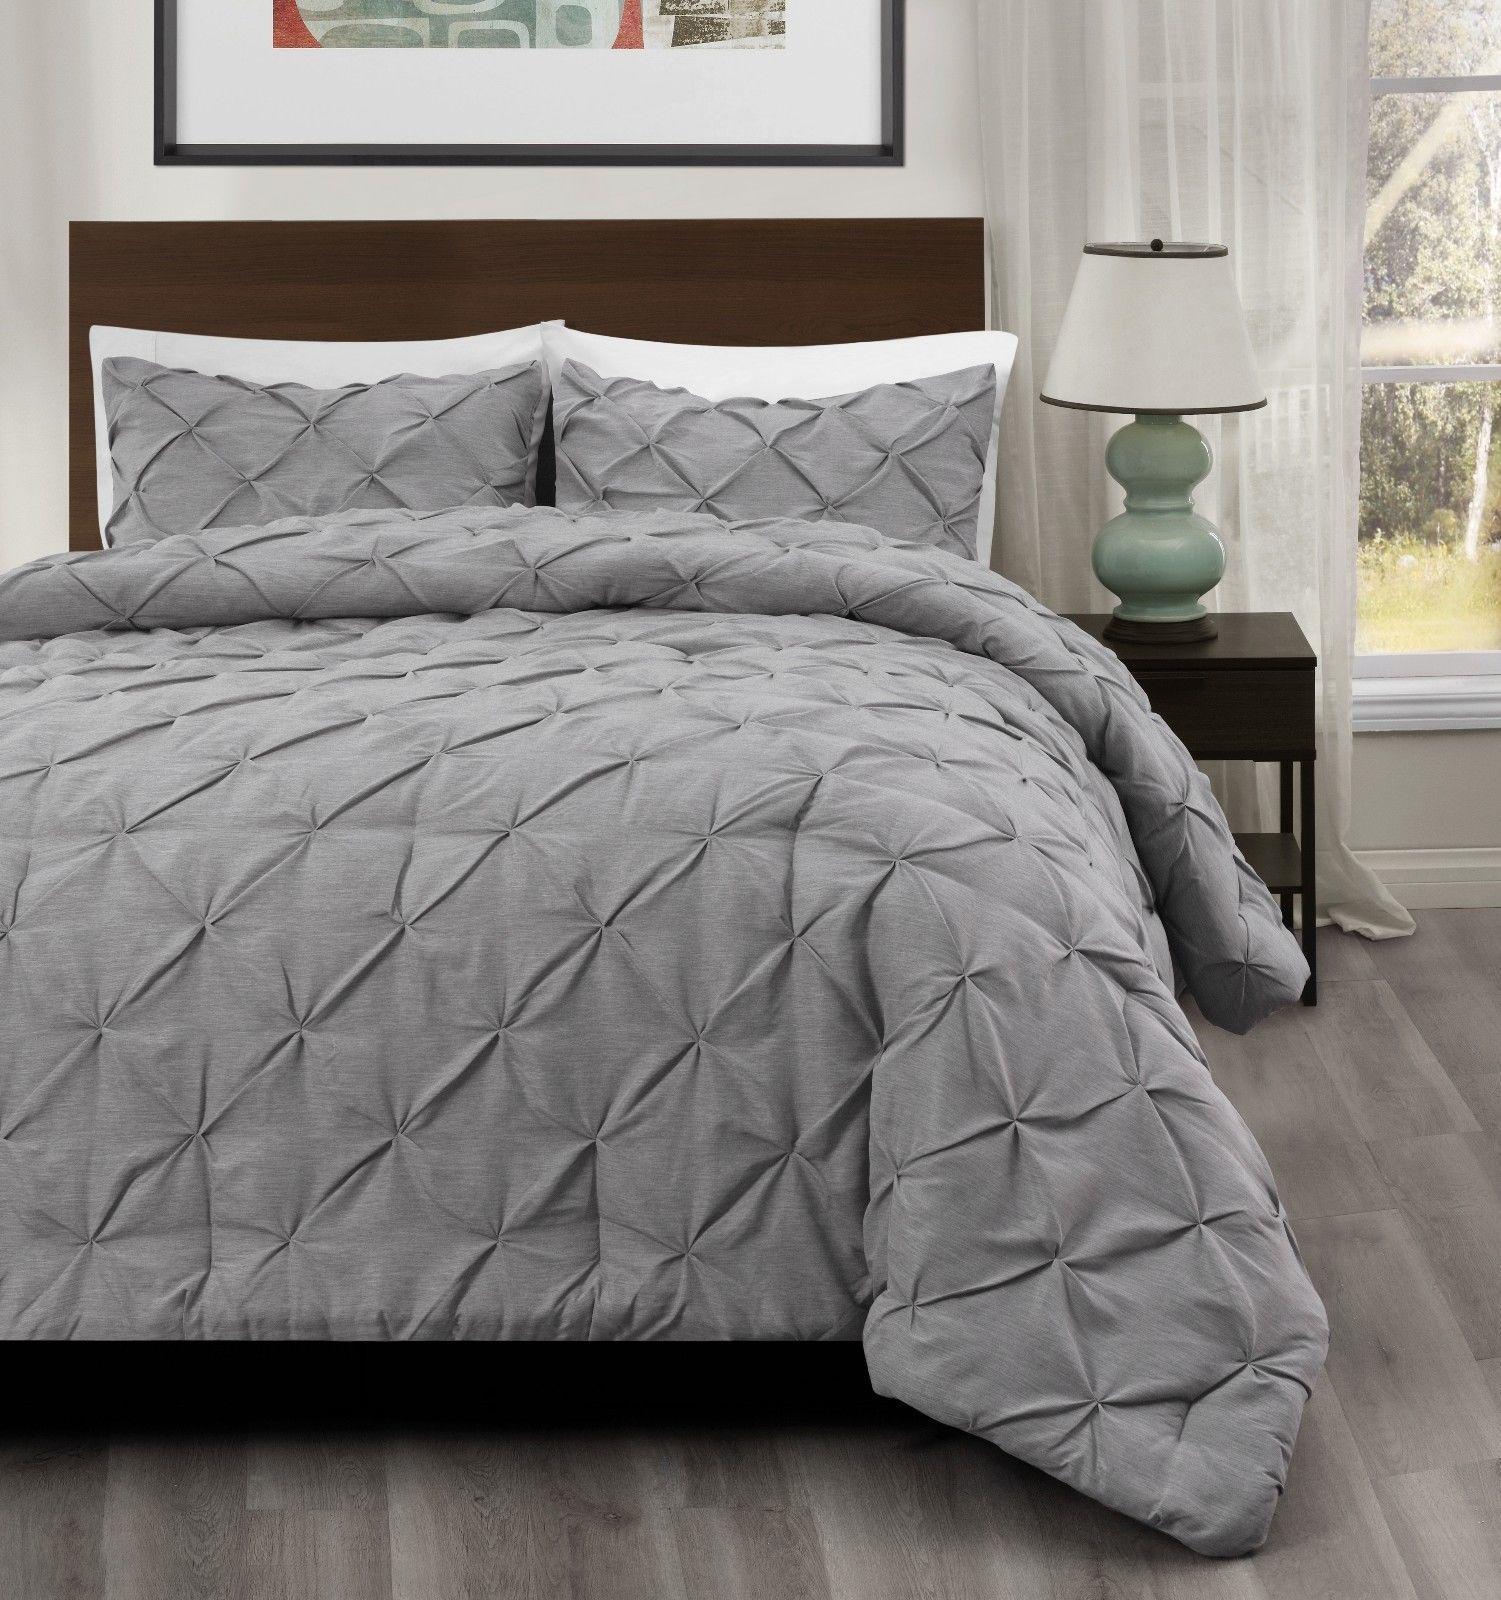 master 3pc pinch pleat comforter set light grey pintuck pattern bedding set comforters sets. Black Bedroom Furniture Sets. Home Design Ideas